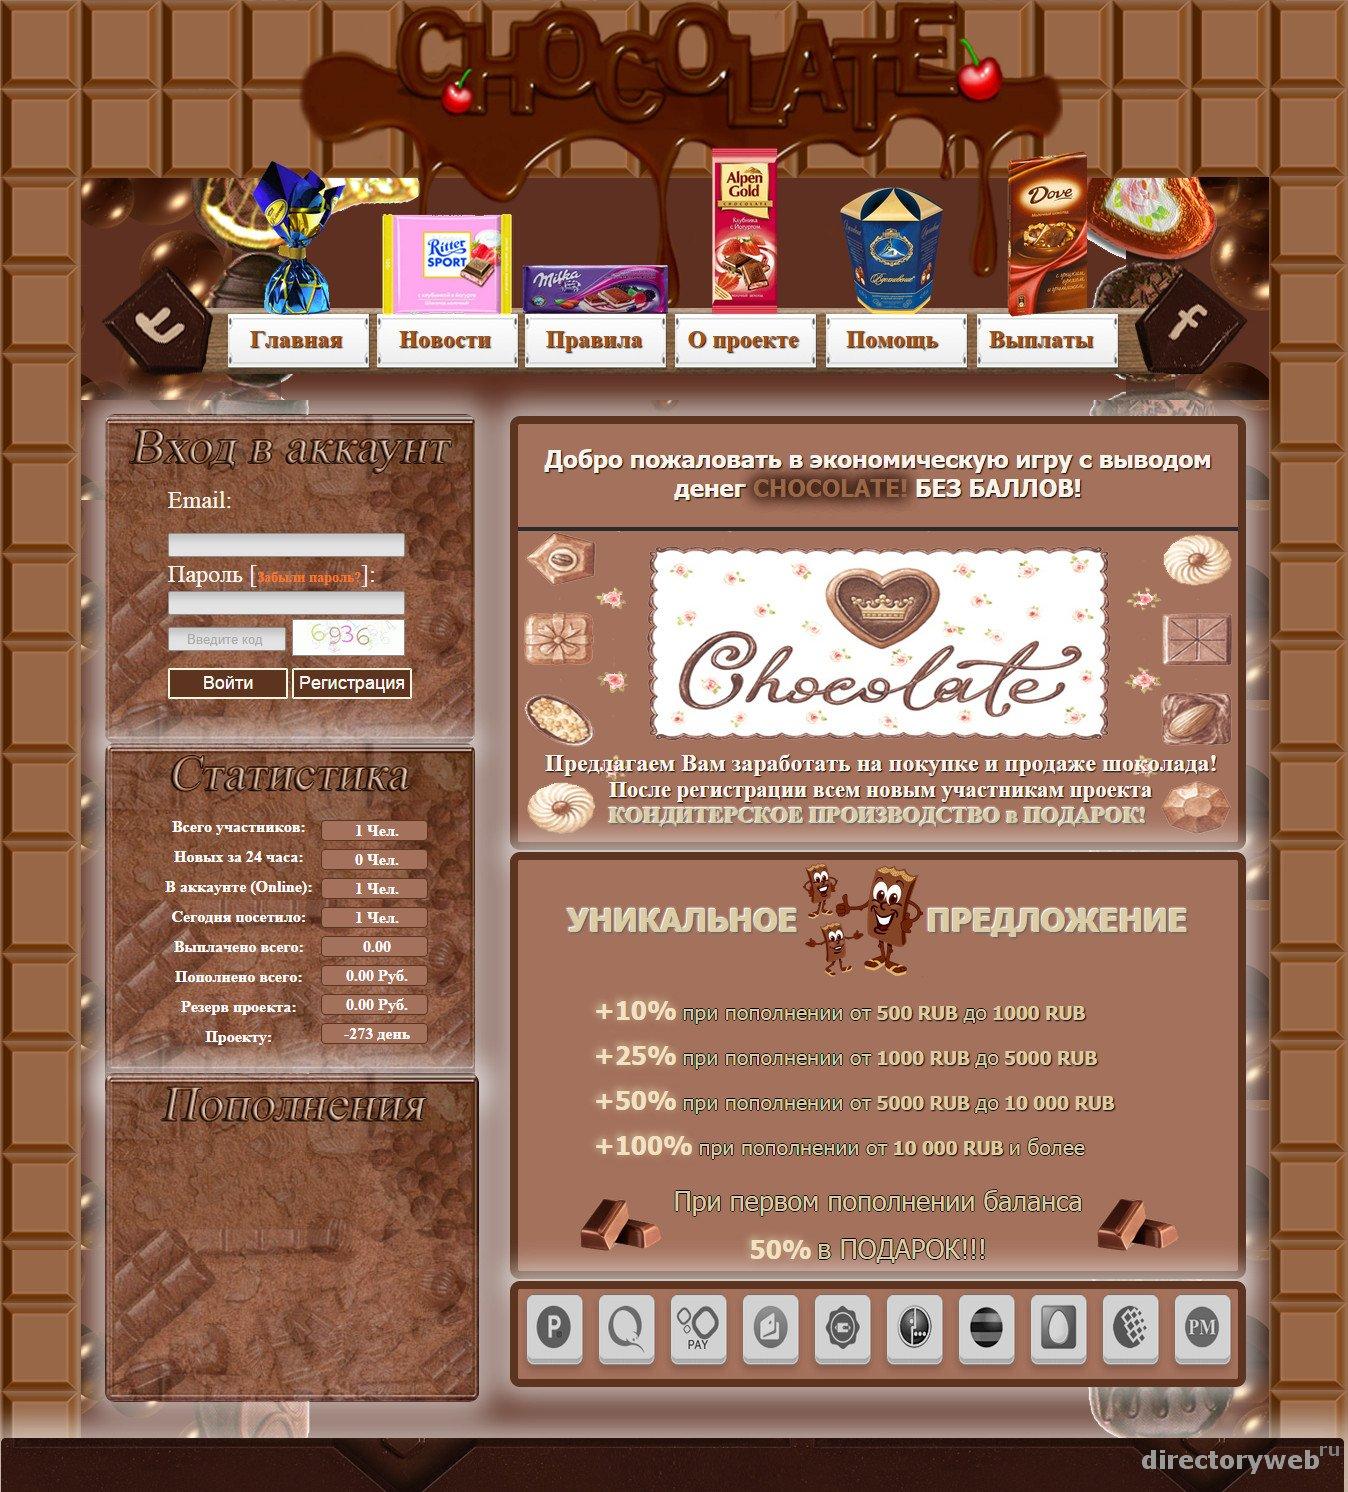 http://directoryweb.ru/uploads/posts/2016-01/1453540012_skript-ekonomicheskoy-onlayn-igry-chocolate.jpg